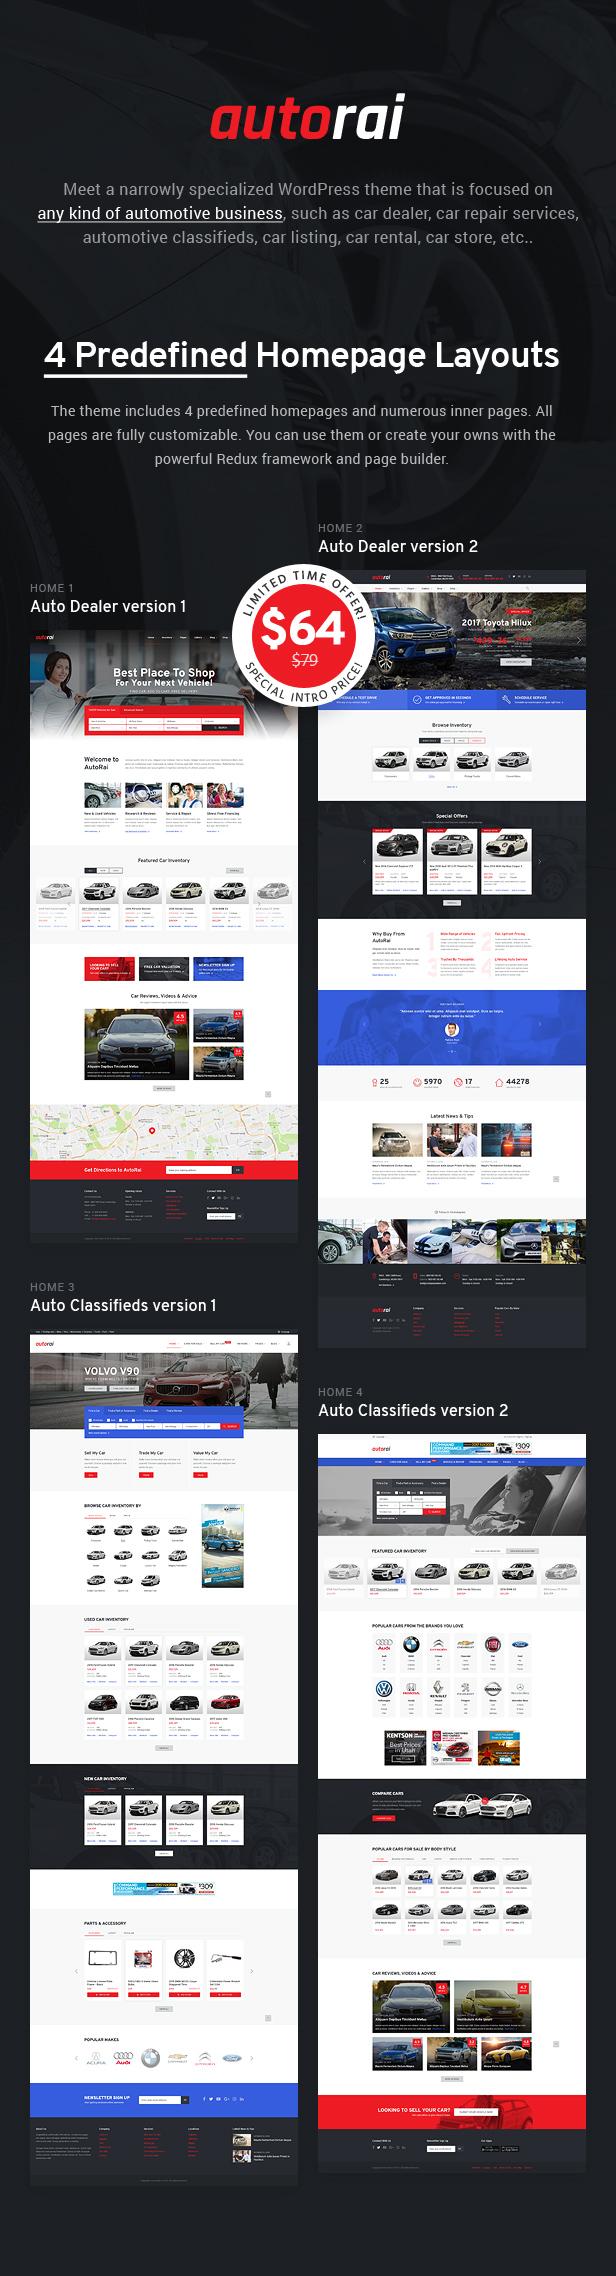 Avtorai- Car Dealer & Automotive Classified WordPress Theme - 1